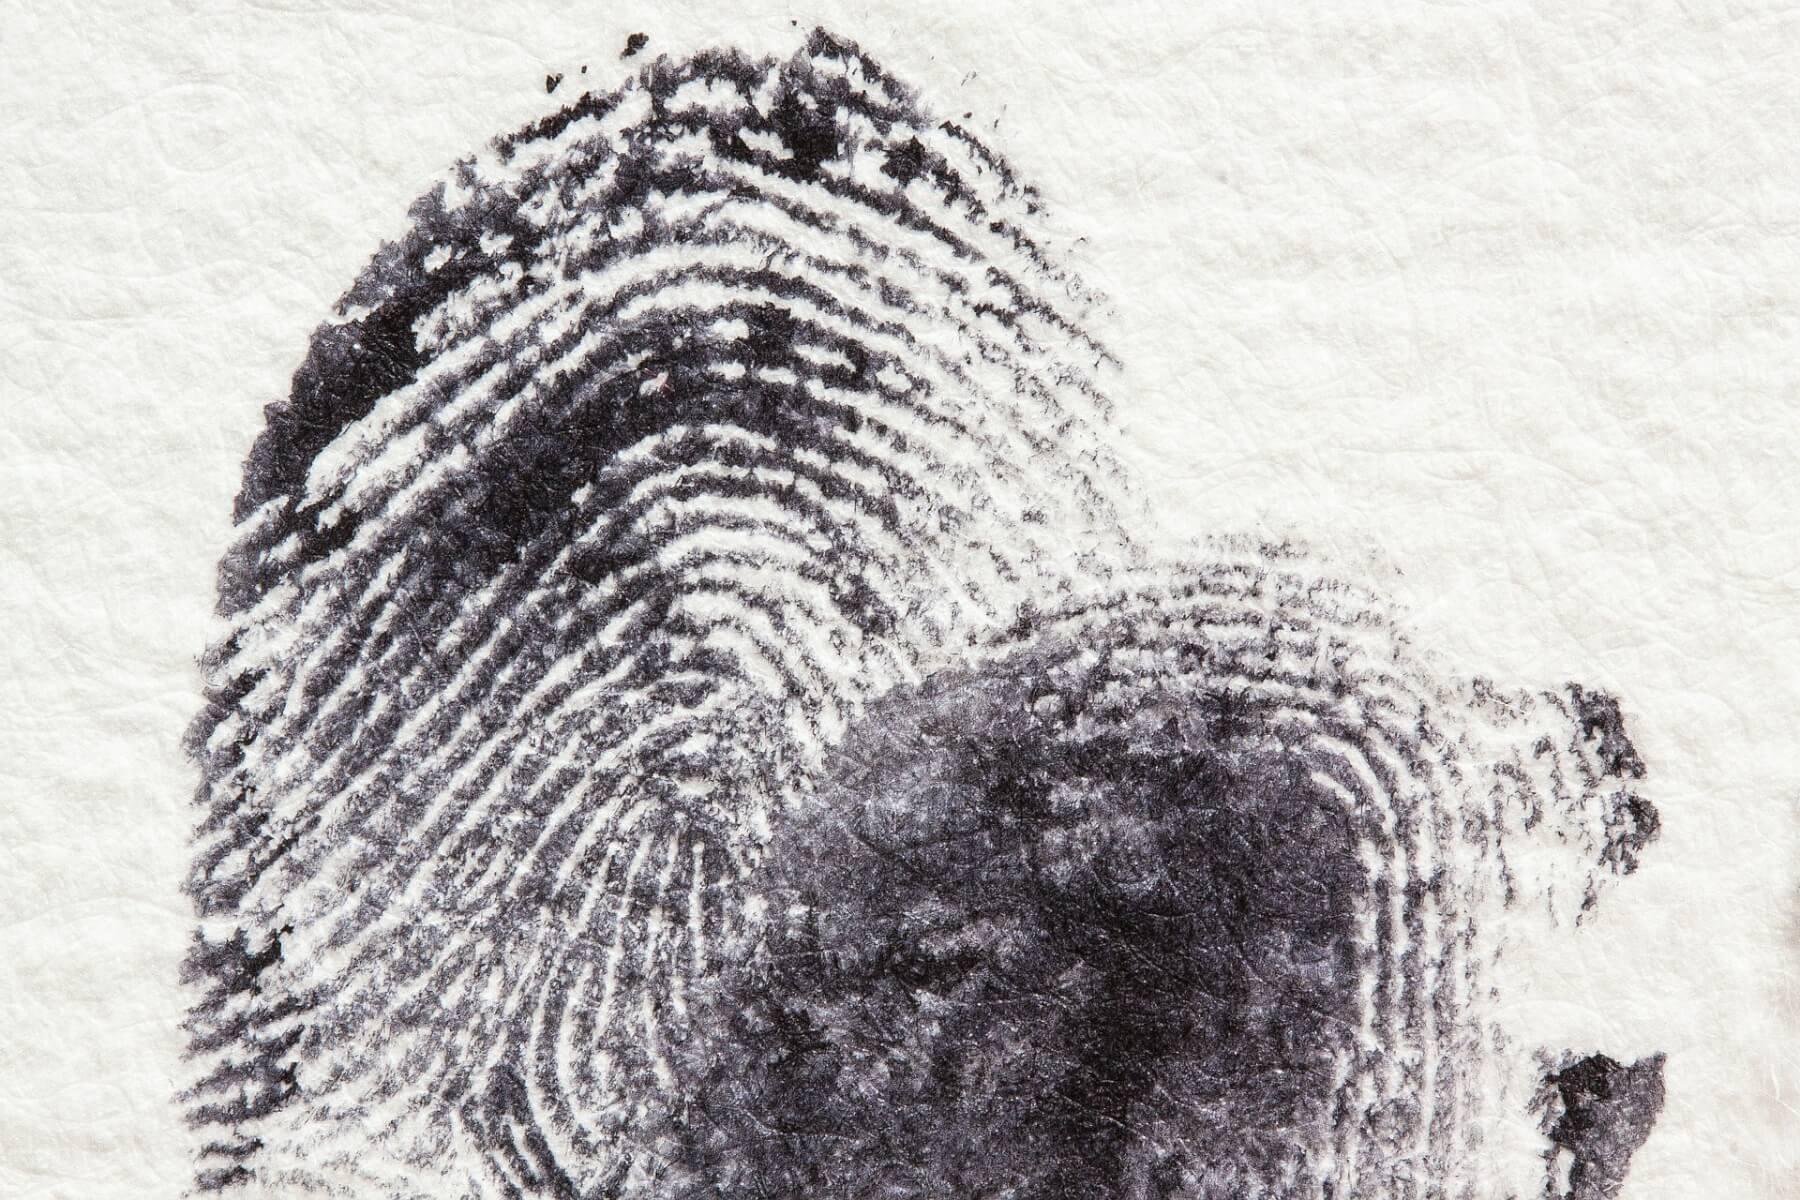 biometric data security flaw